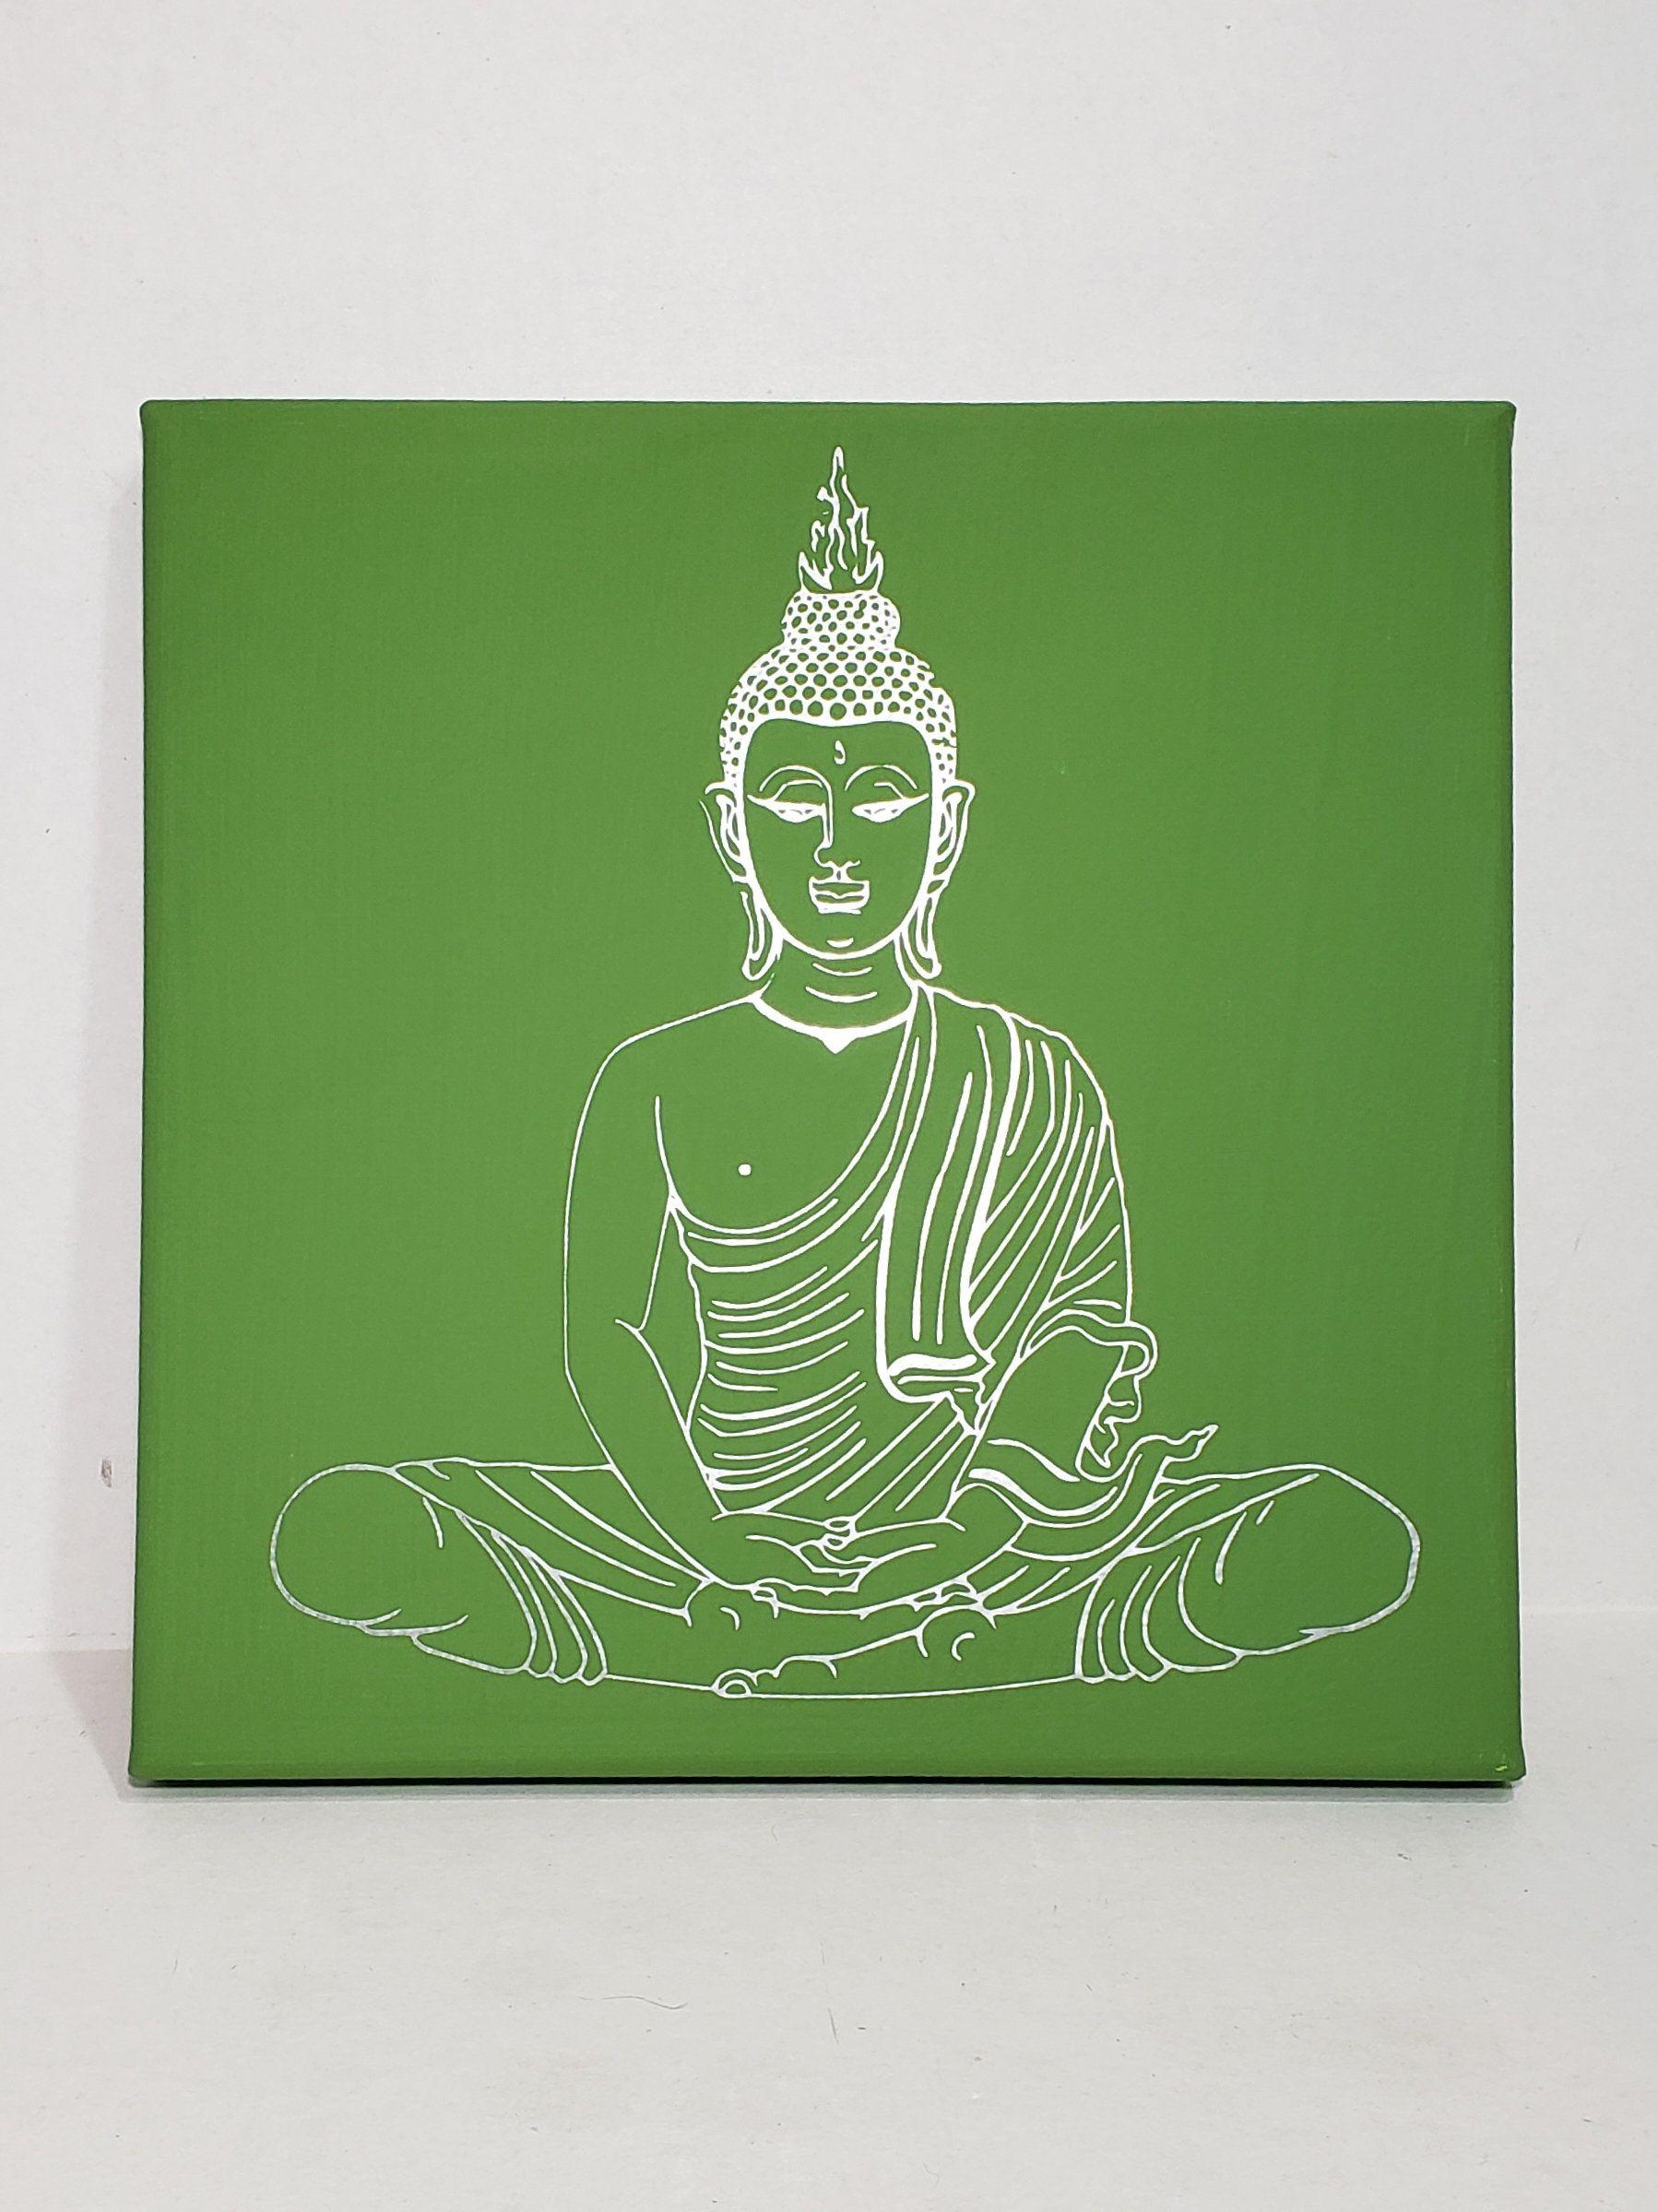 8x8 Bedroom Design: Buddha Art, Zen Art, Buddha On Canvas, 8x8 Art, Bedroom